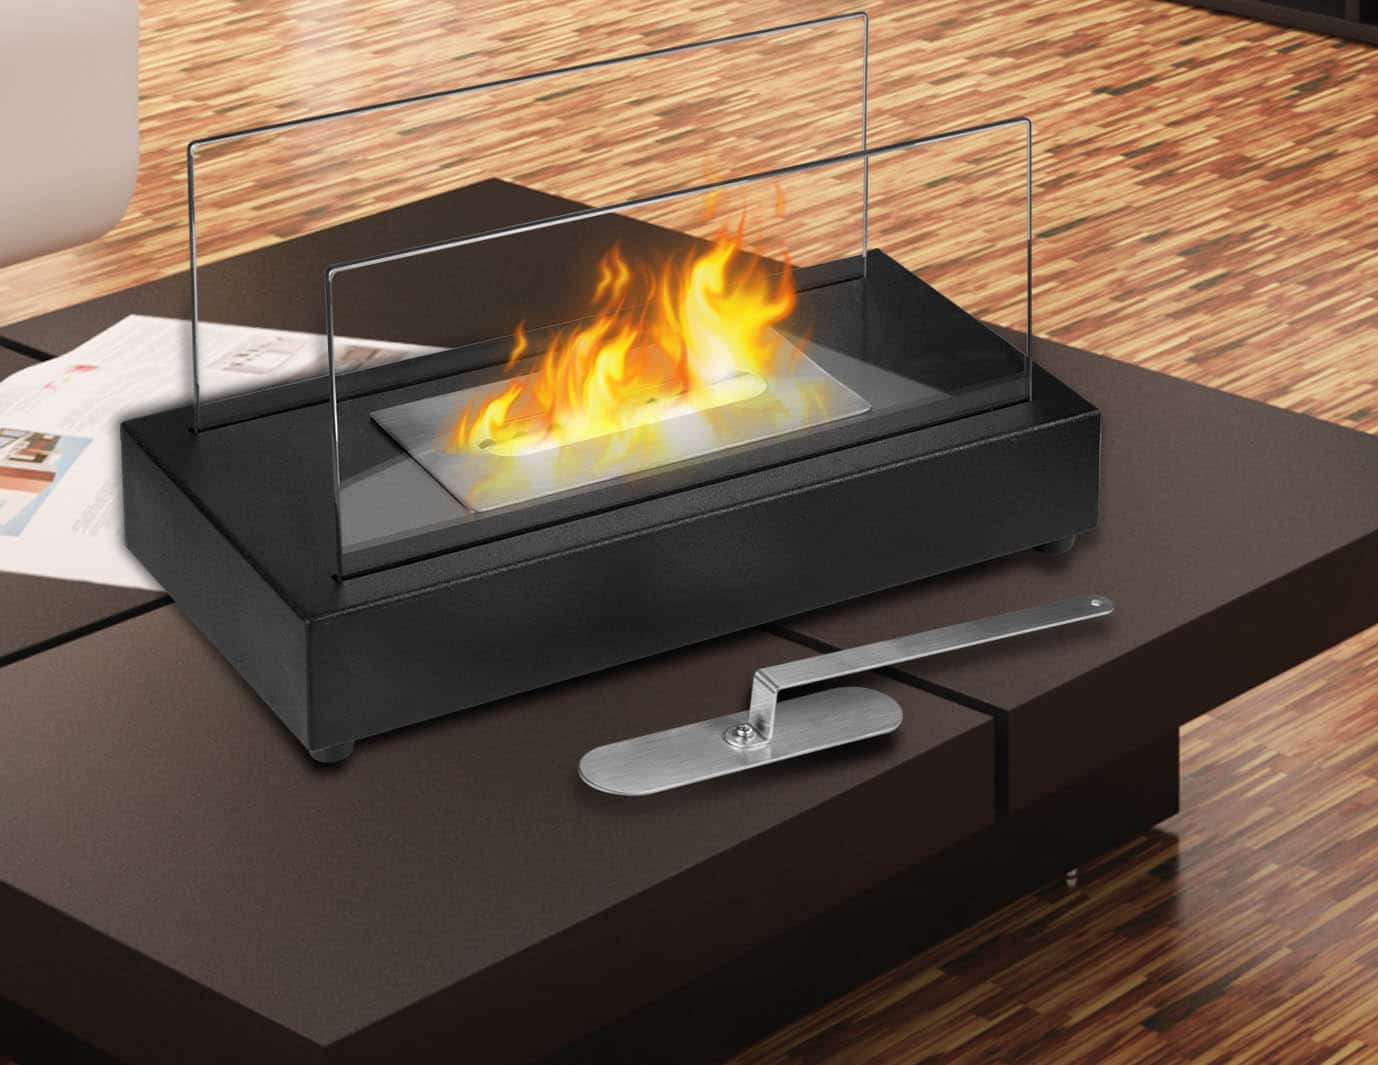 gagnez un foyer de table l 39 thanol de 125 quebec echantillons gratuits. Black Bedroom Furniture Sets. Home Design Ideas